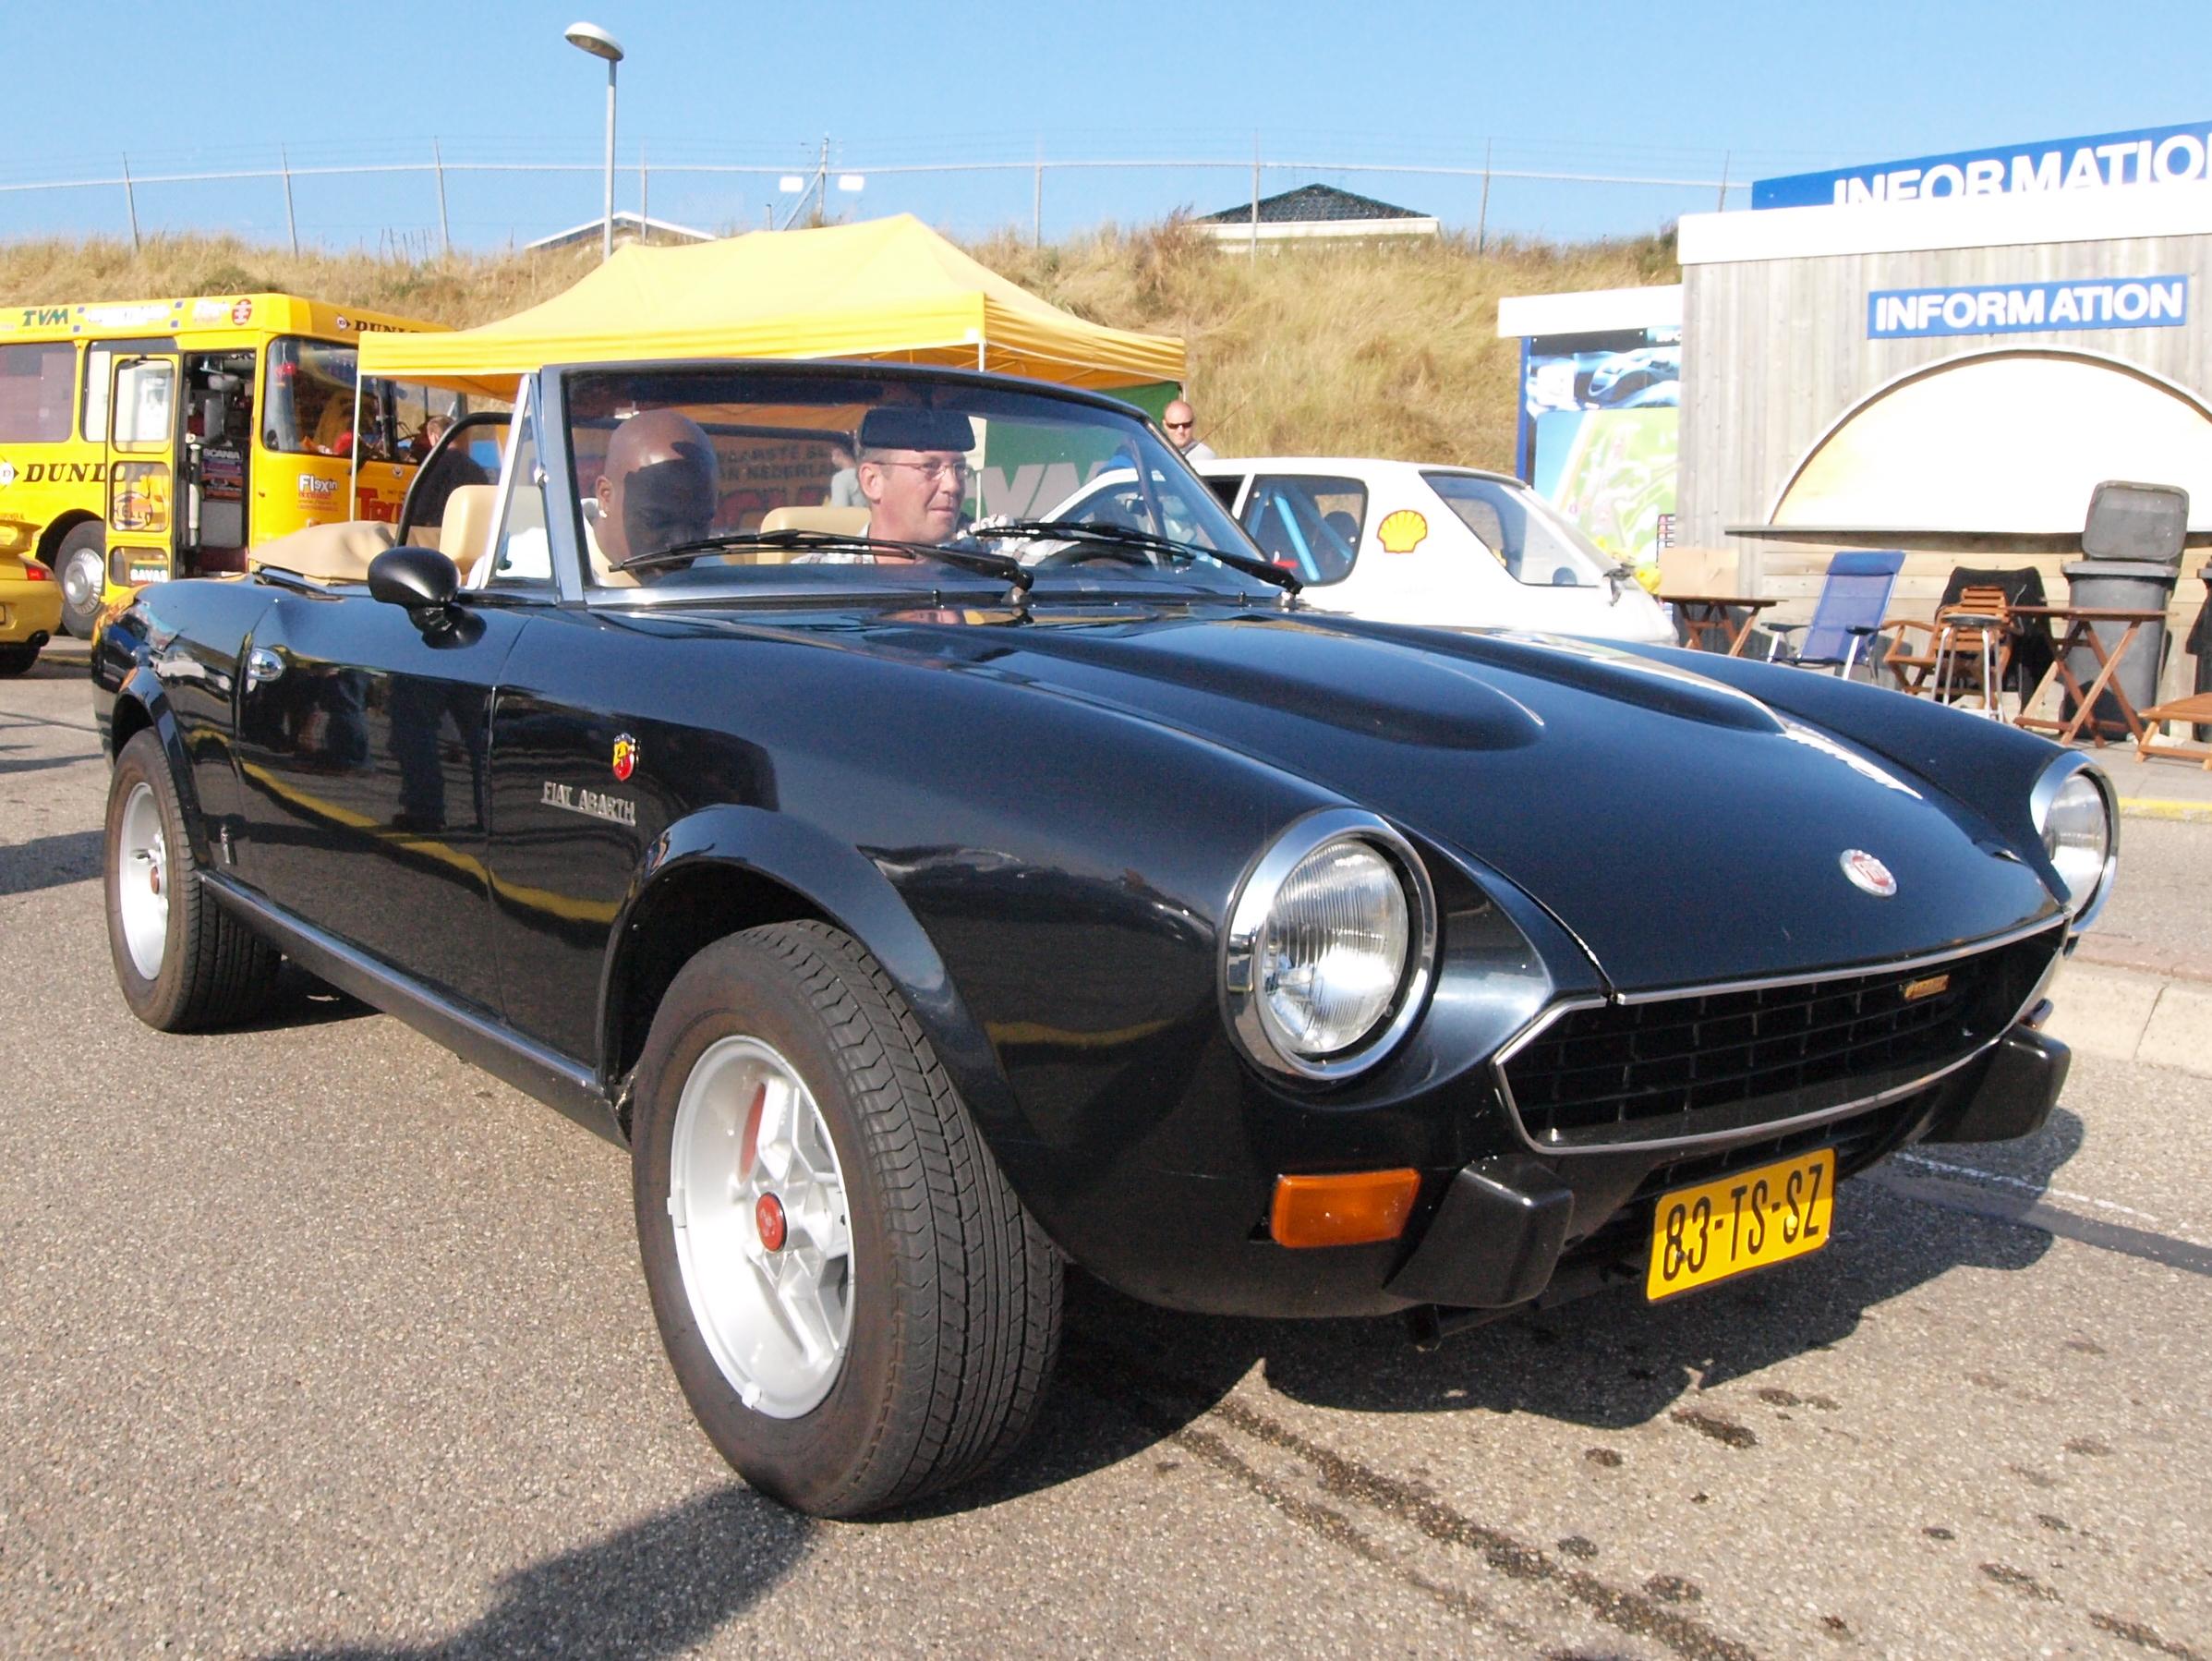 Fiat Spider Related Imagesstart 350 Weili Automotive Network 1969 124 Sport Filefiat 2000 Usa Dutch Licence Registration 83 Ts Sz Pic2